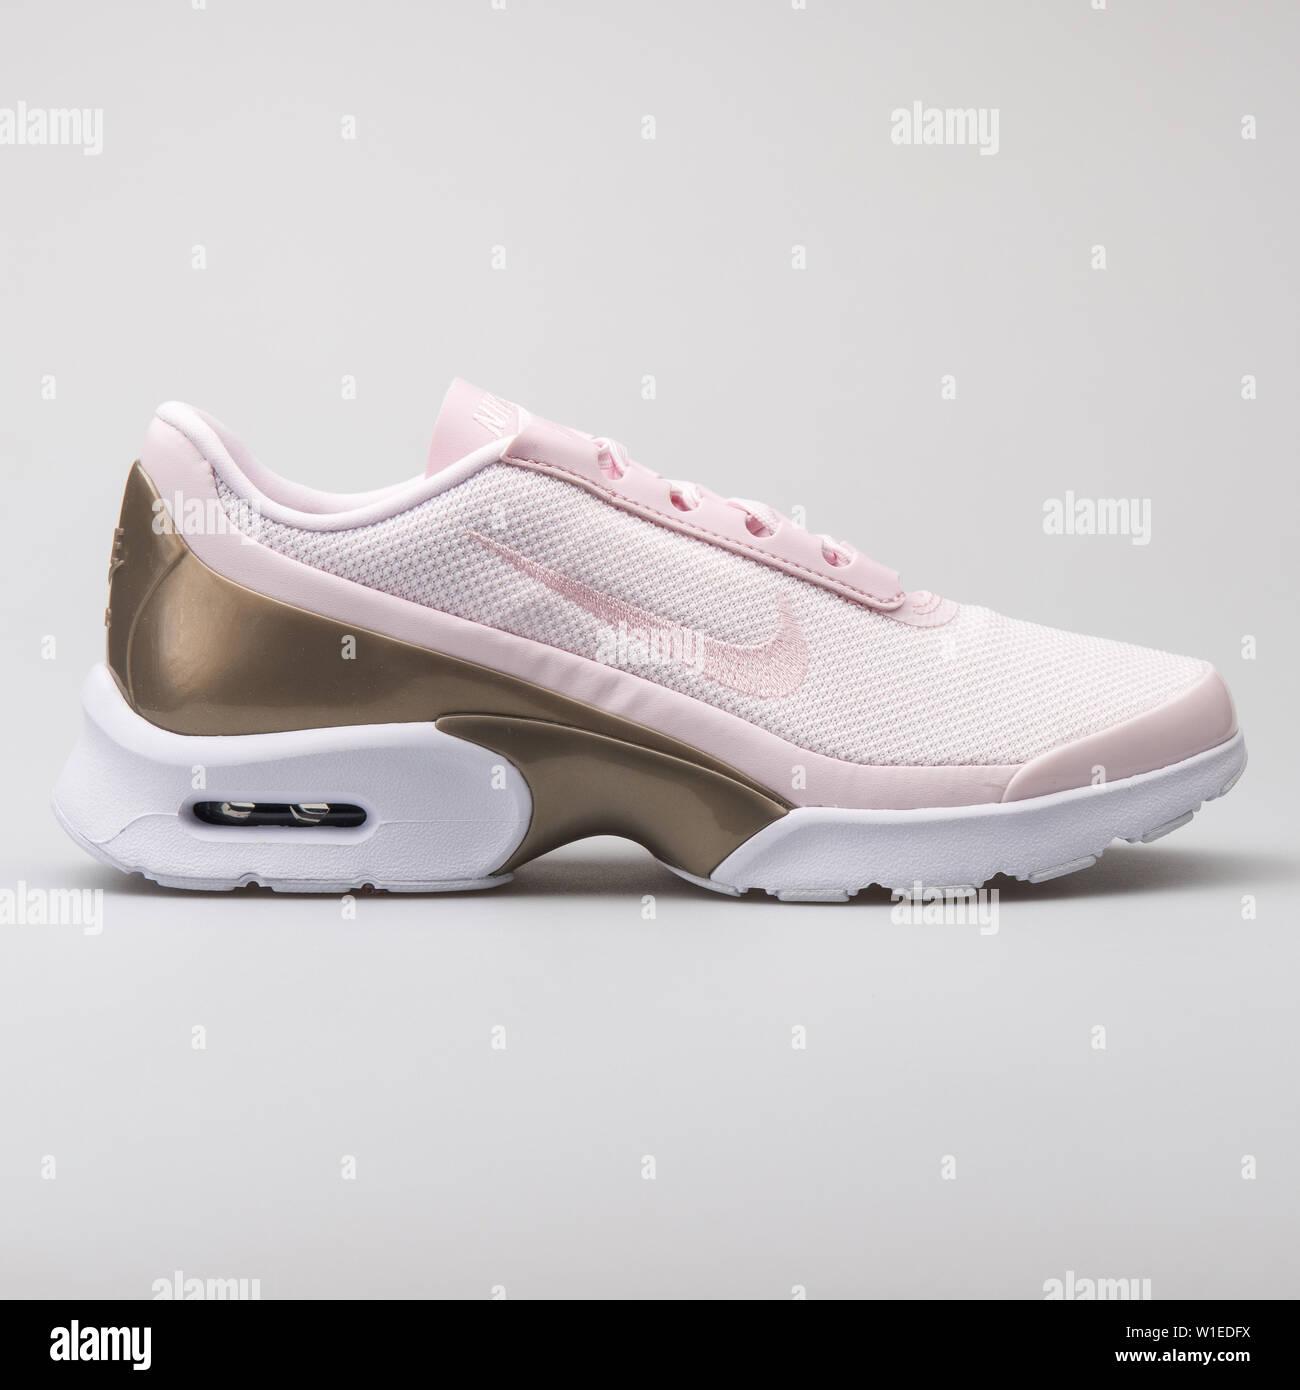 separation shoes 89a17 fe438 VIENNA, AUSTRIA - AUGUST 7, 2017: Nike Air Max Sequent 2 ...